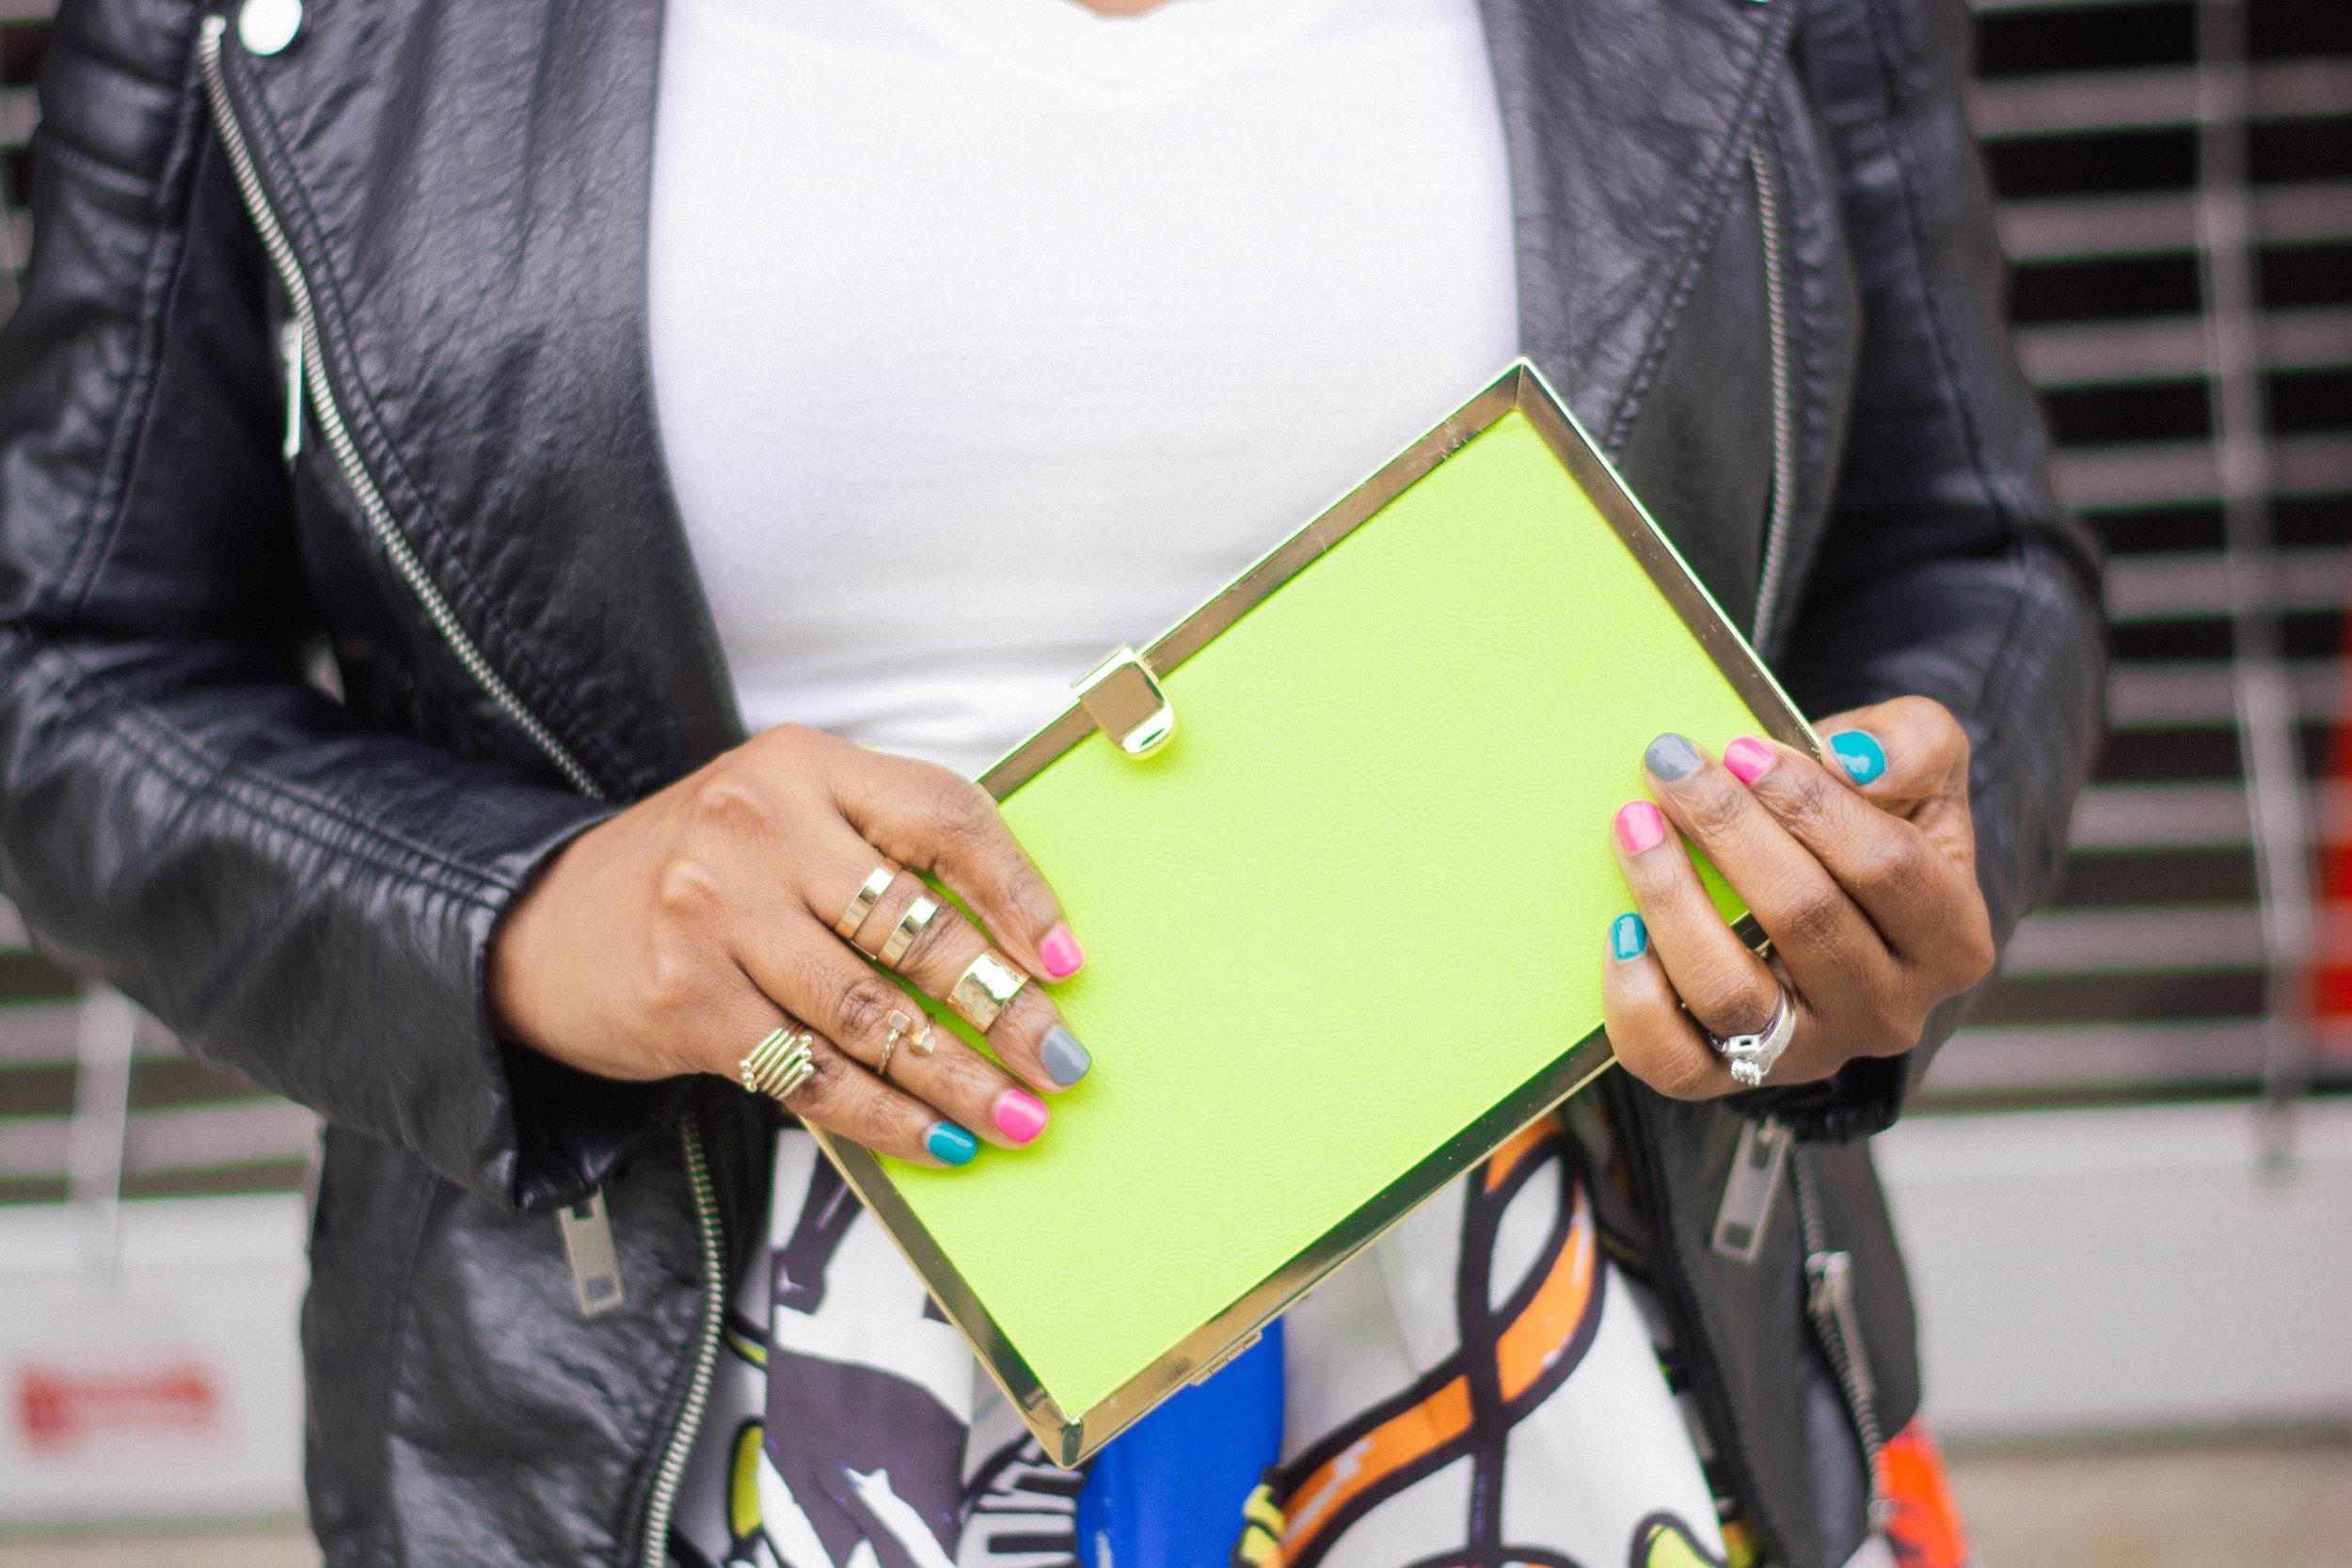 Melodie Stewart, The Style Klazit, graffiti print skirt, shoedazzle white sneakers, h&m black moto jacket, Atlanta style blogger, street style